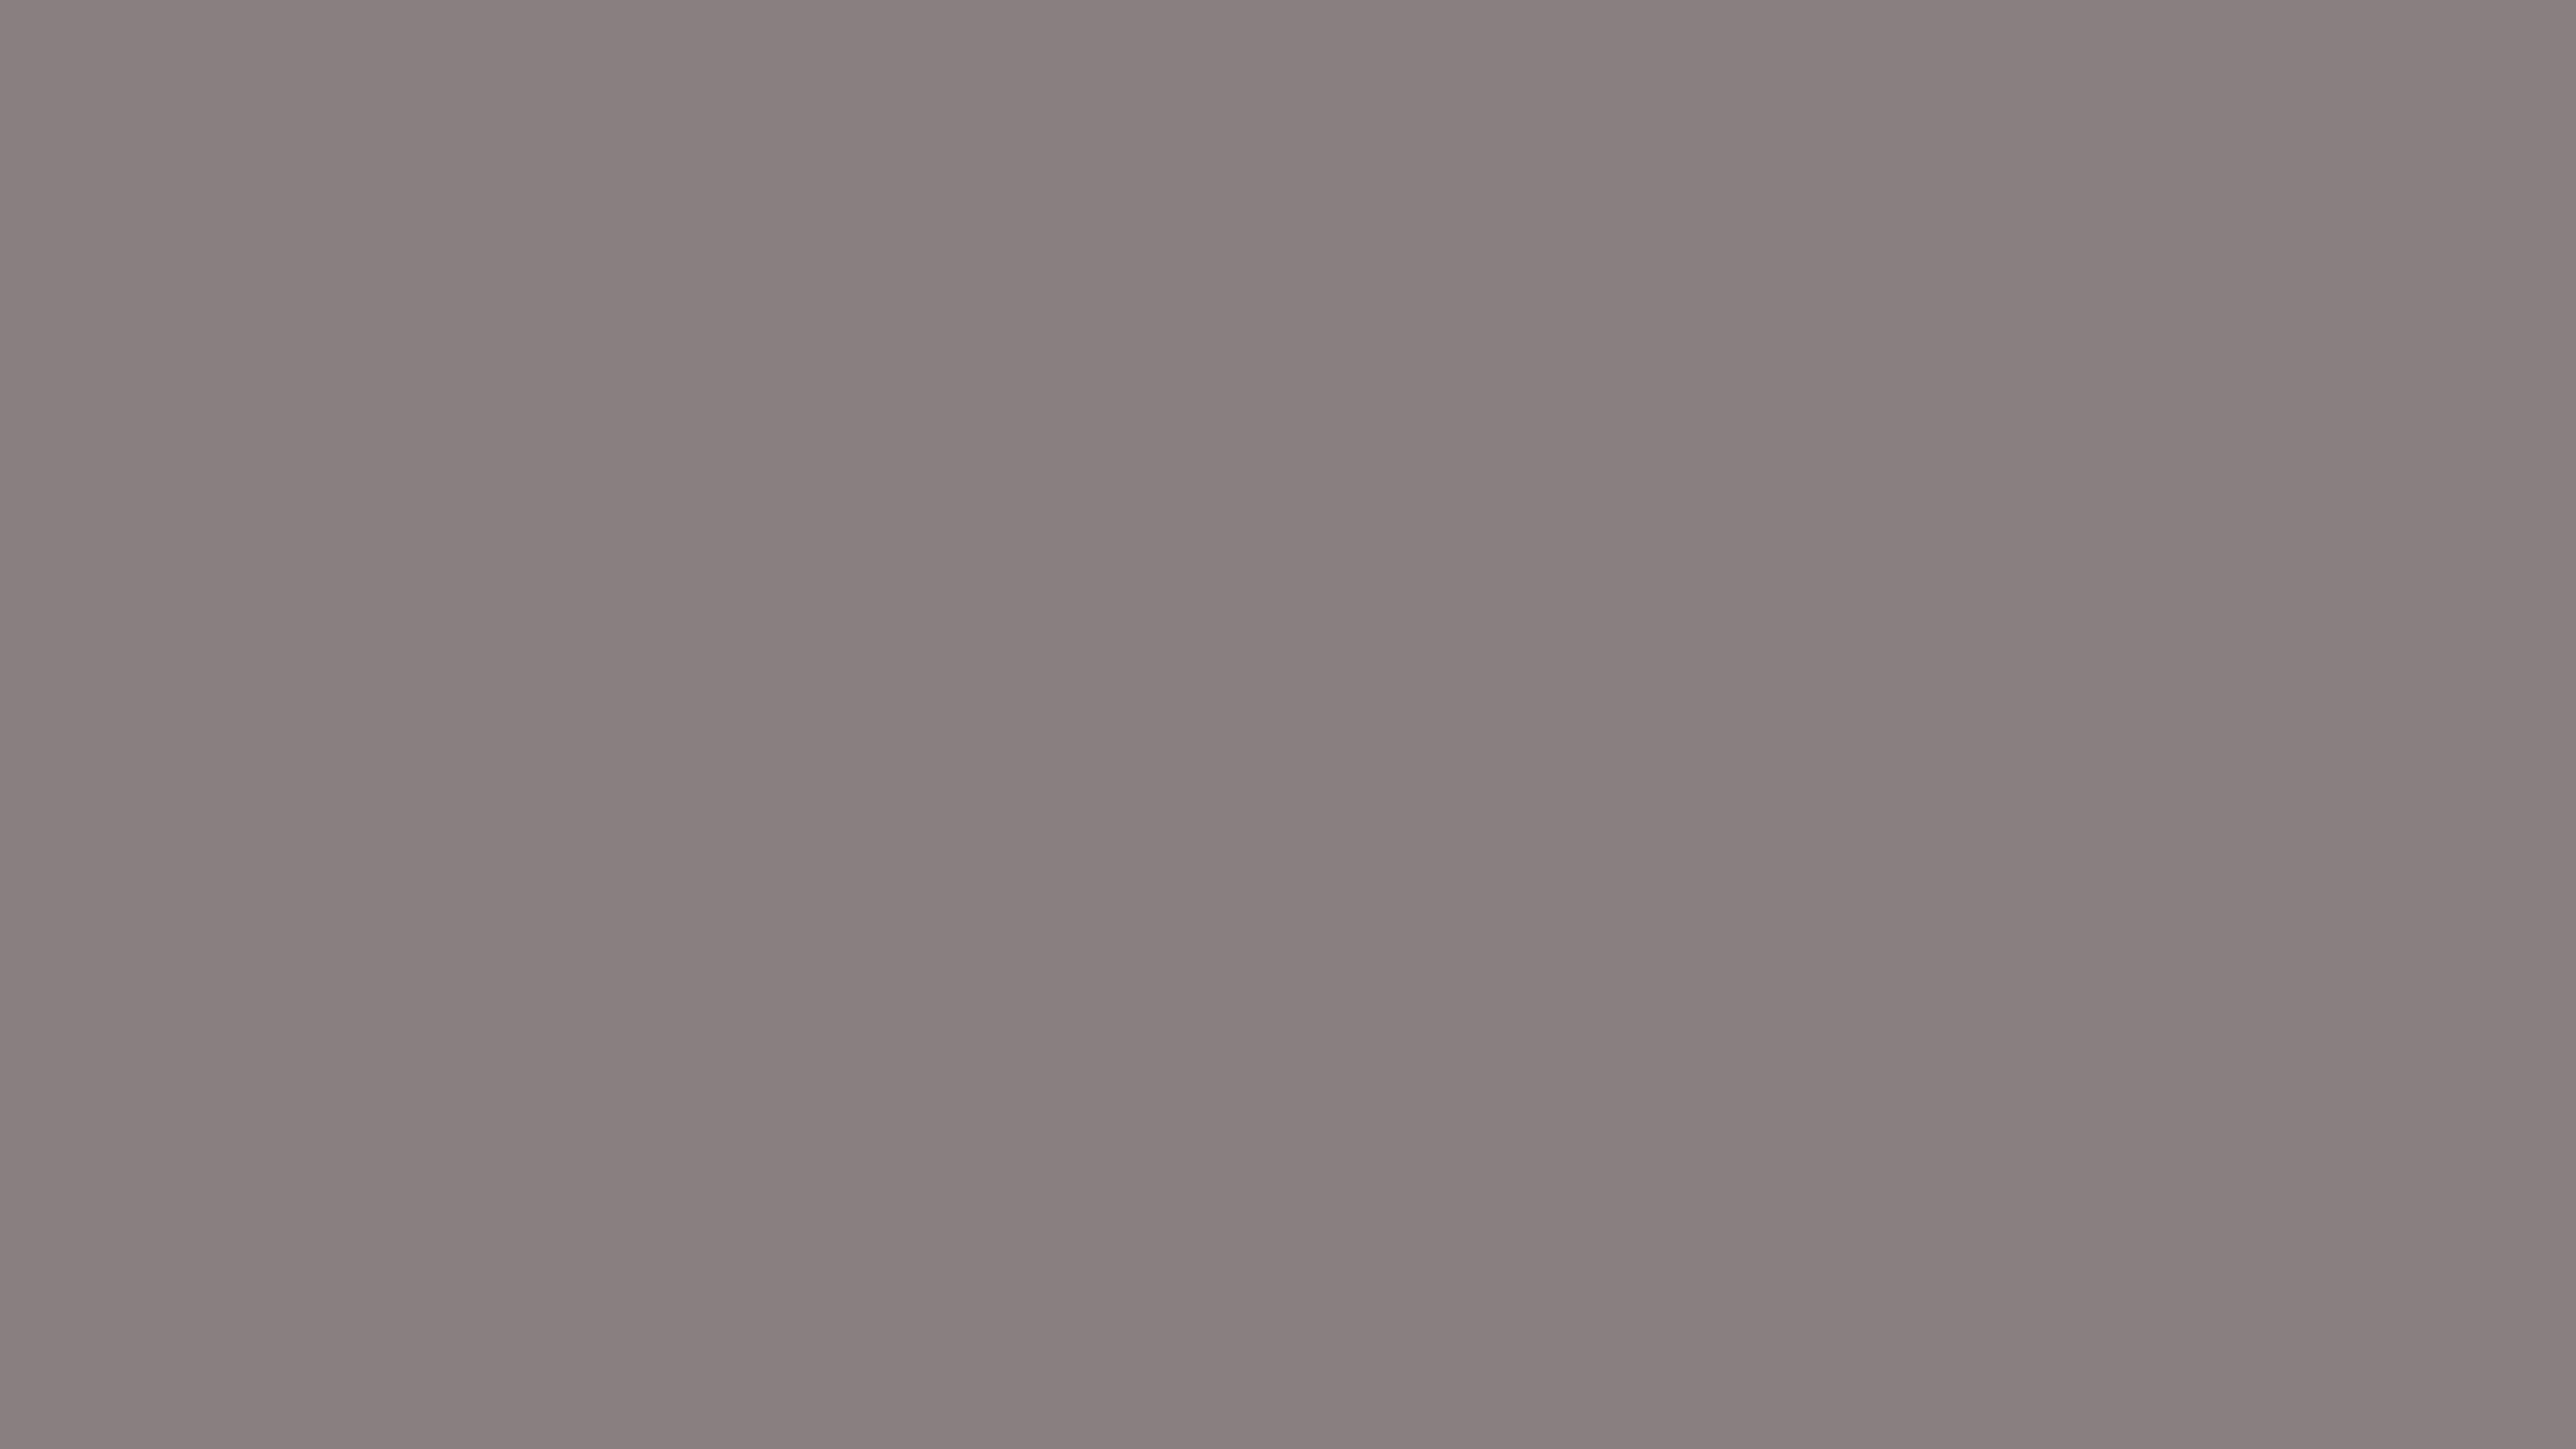 5120x2880 Rocket Metallic Solid Color Background